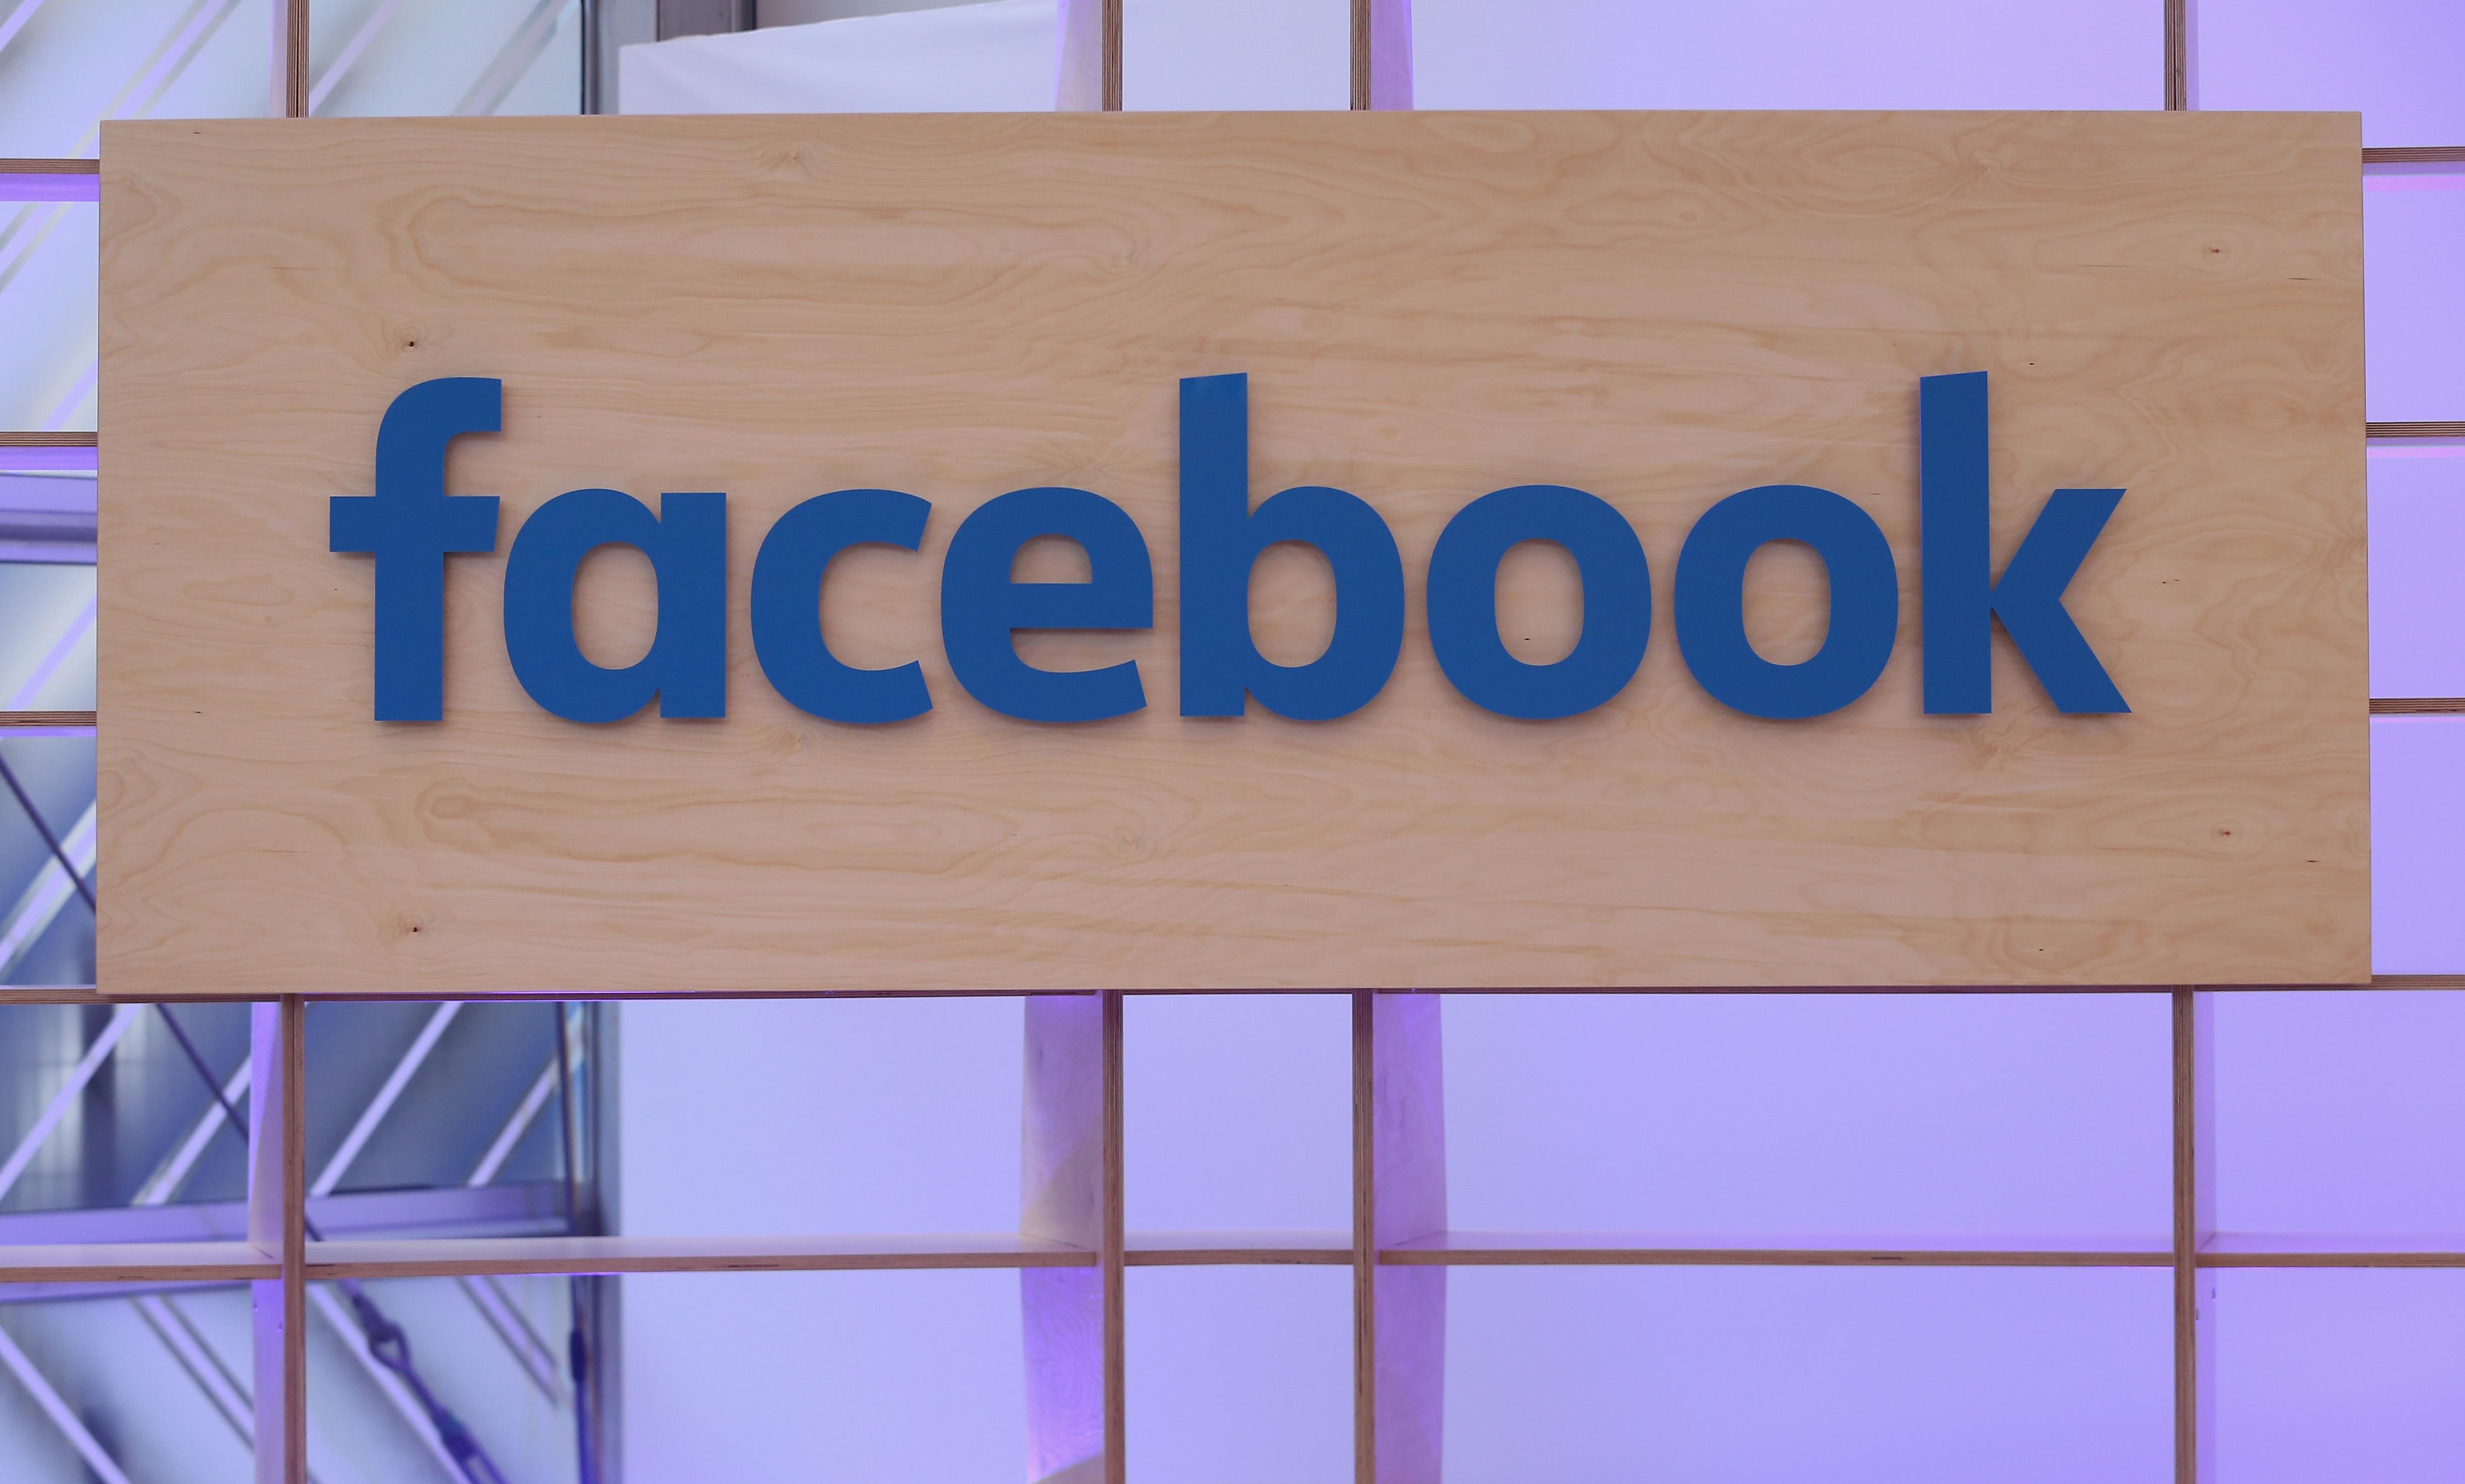 Facebook sign.